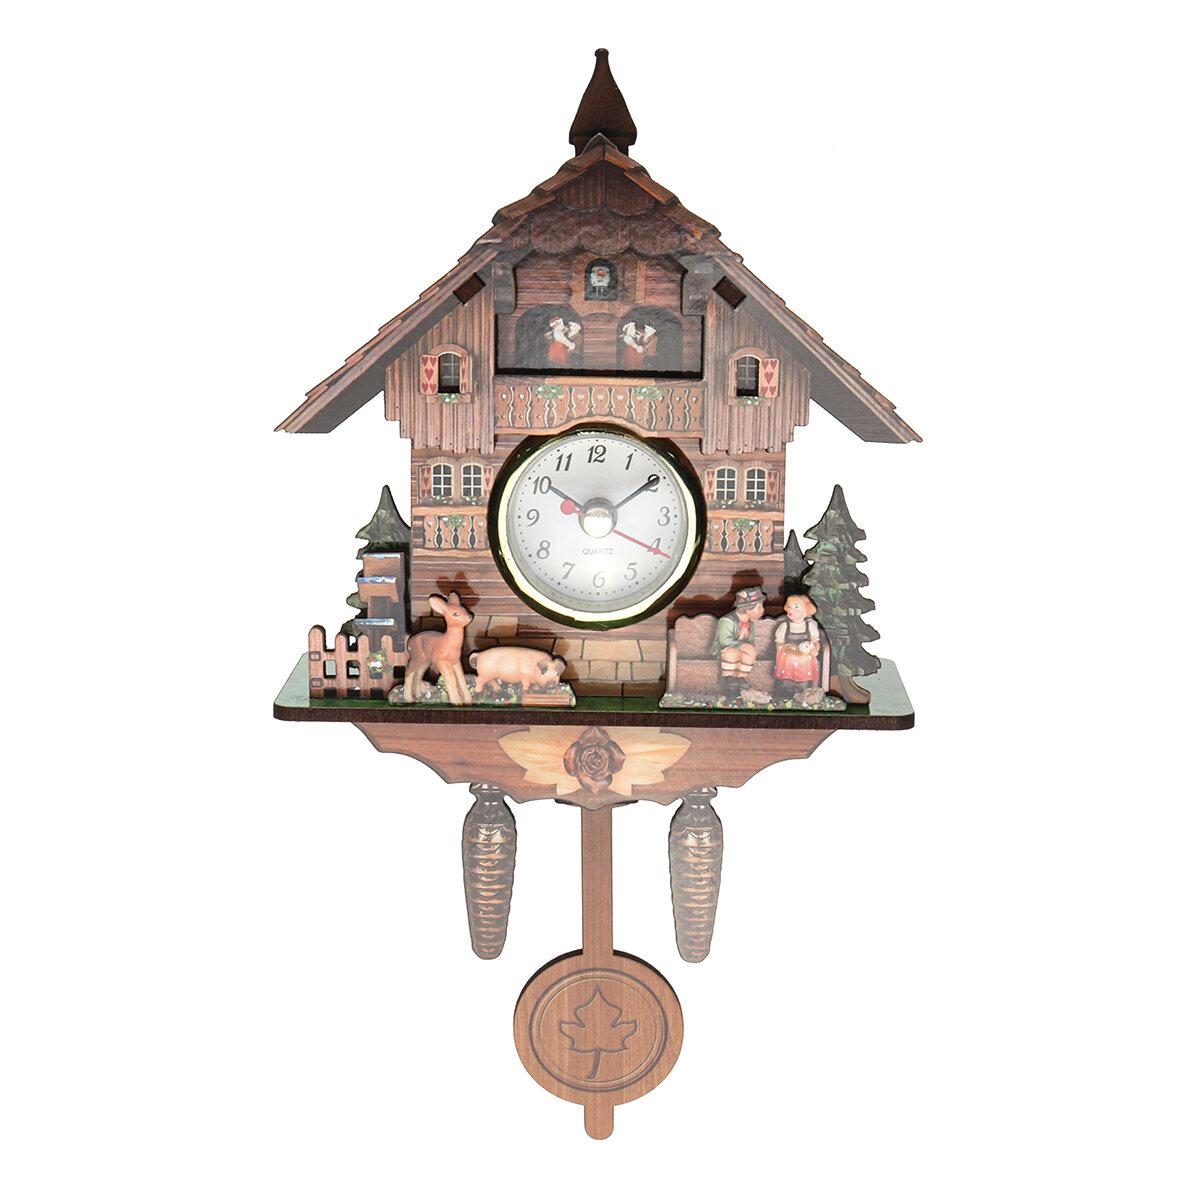 Cuckoo Clock Mount Wooden Wall Clock Analog Auto Swinging Pendulum Home  Decorations